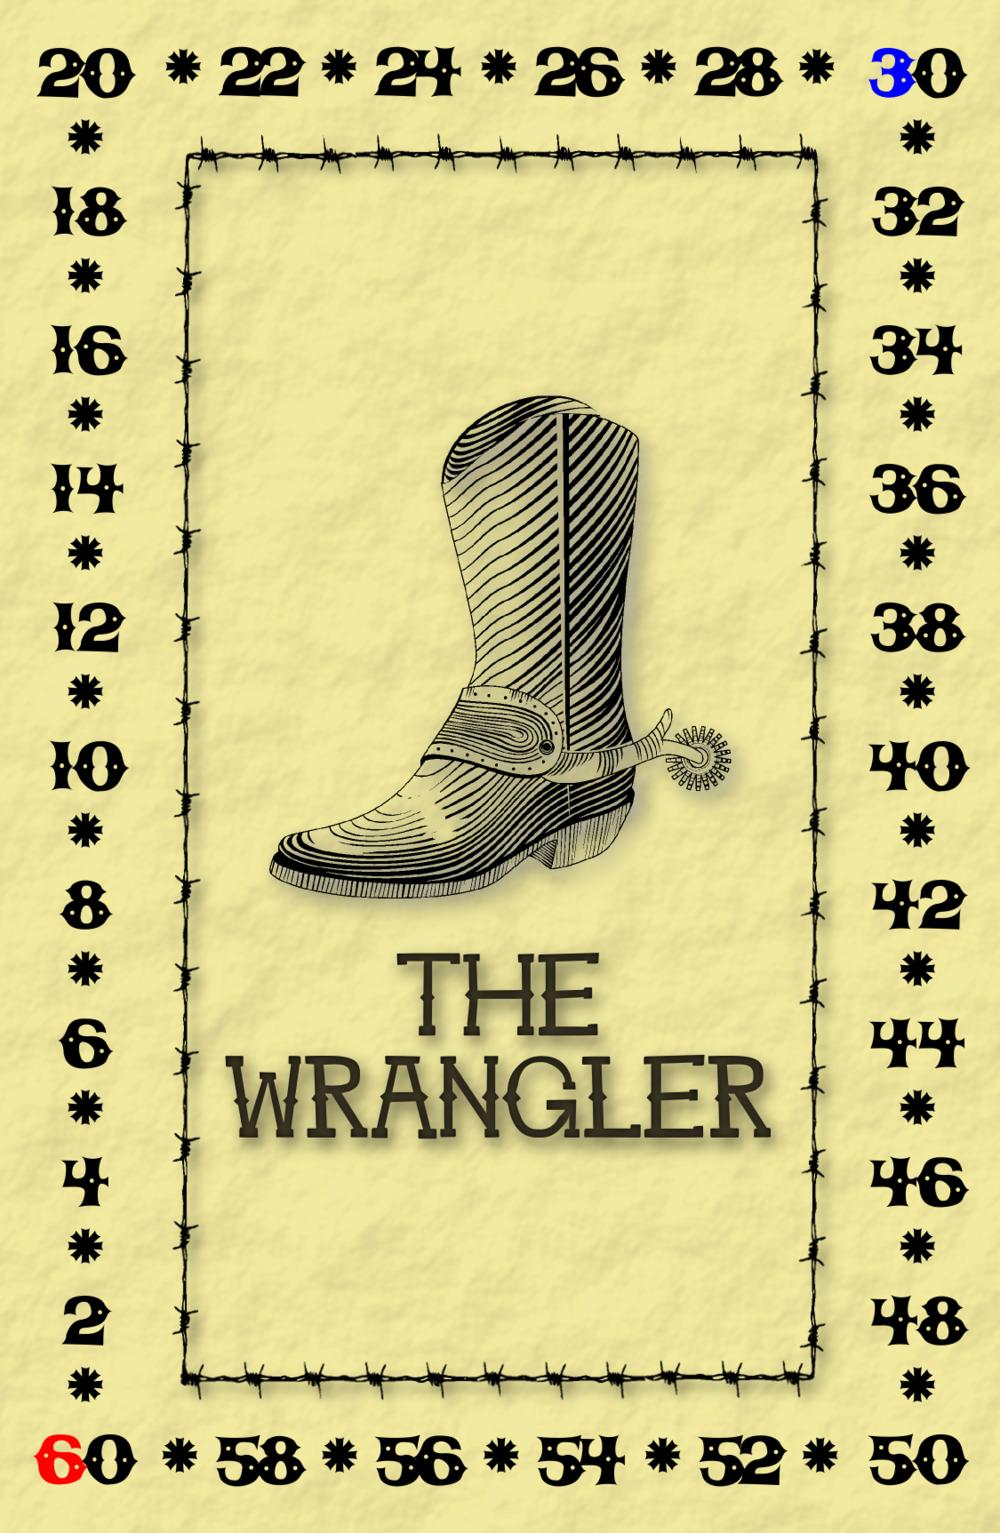 Score Card-Wrangler.png